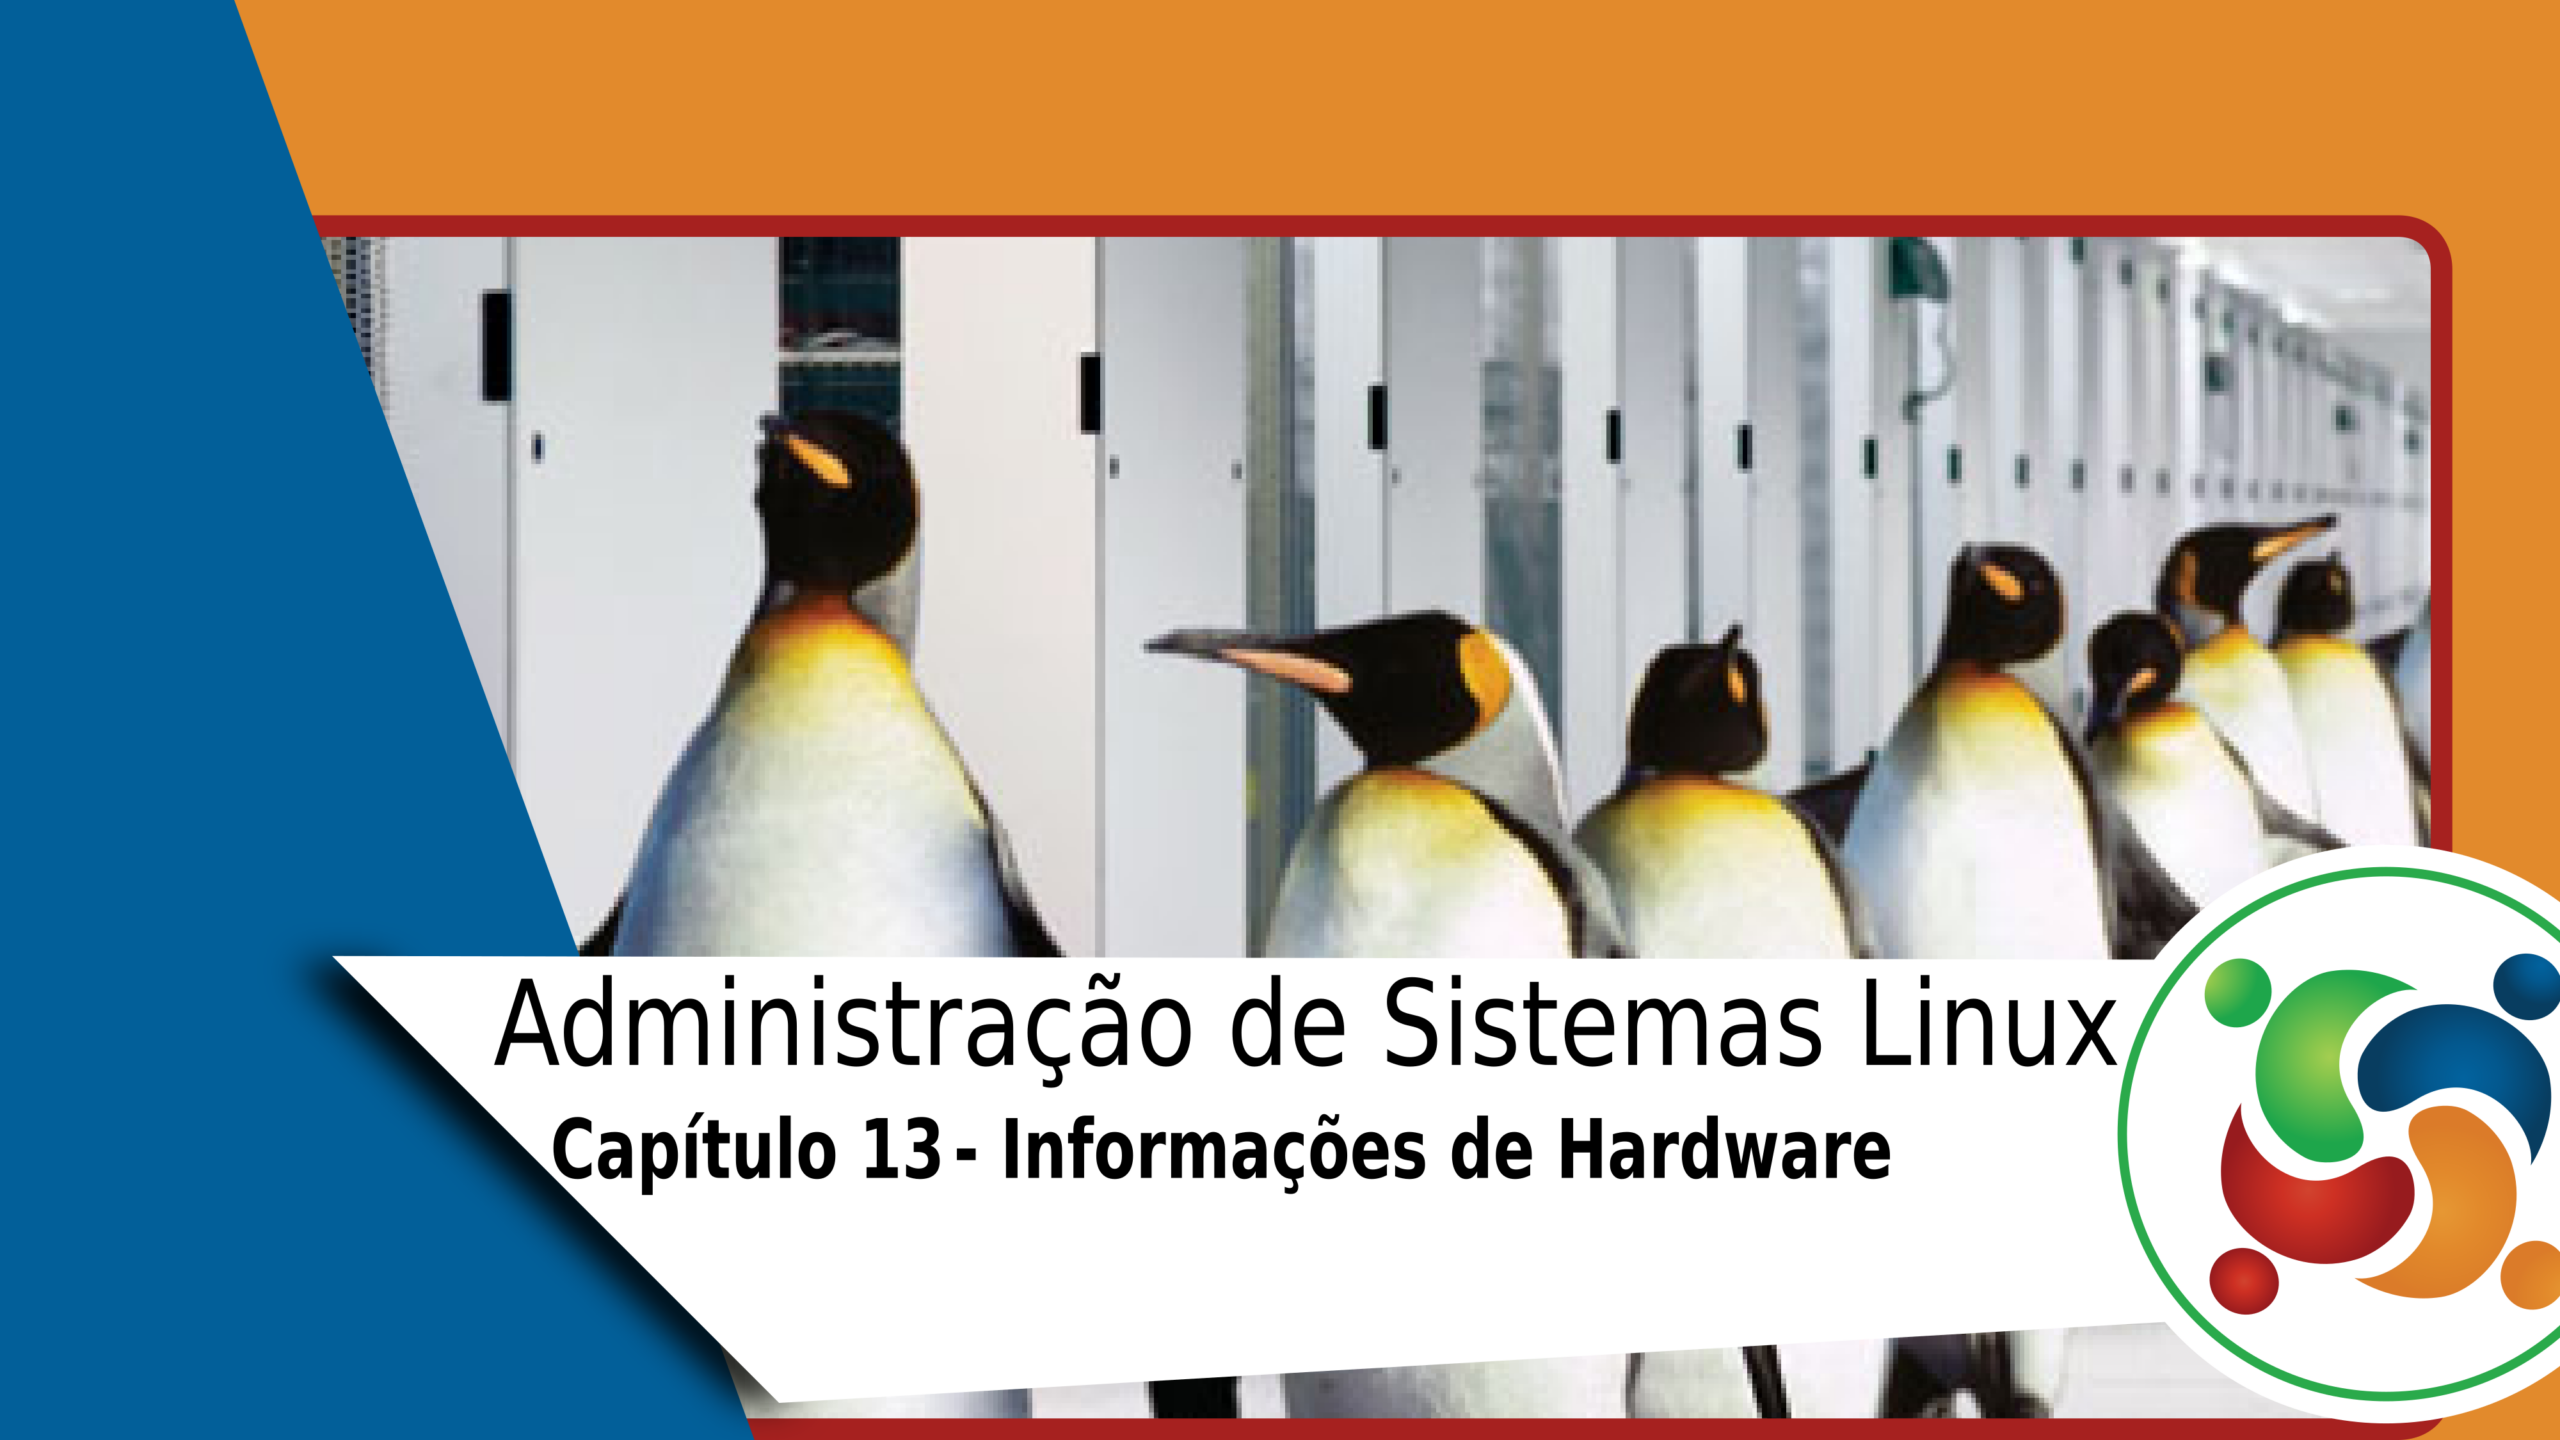 Informações de Hardware